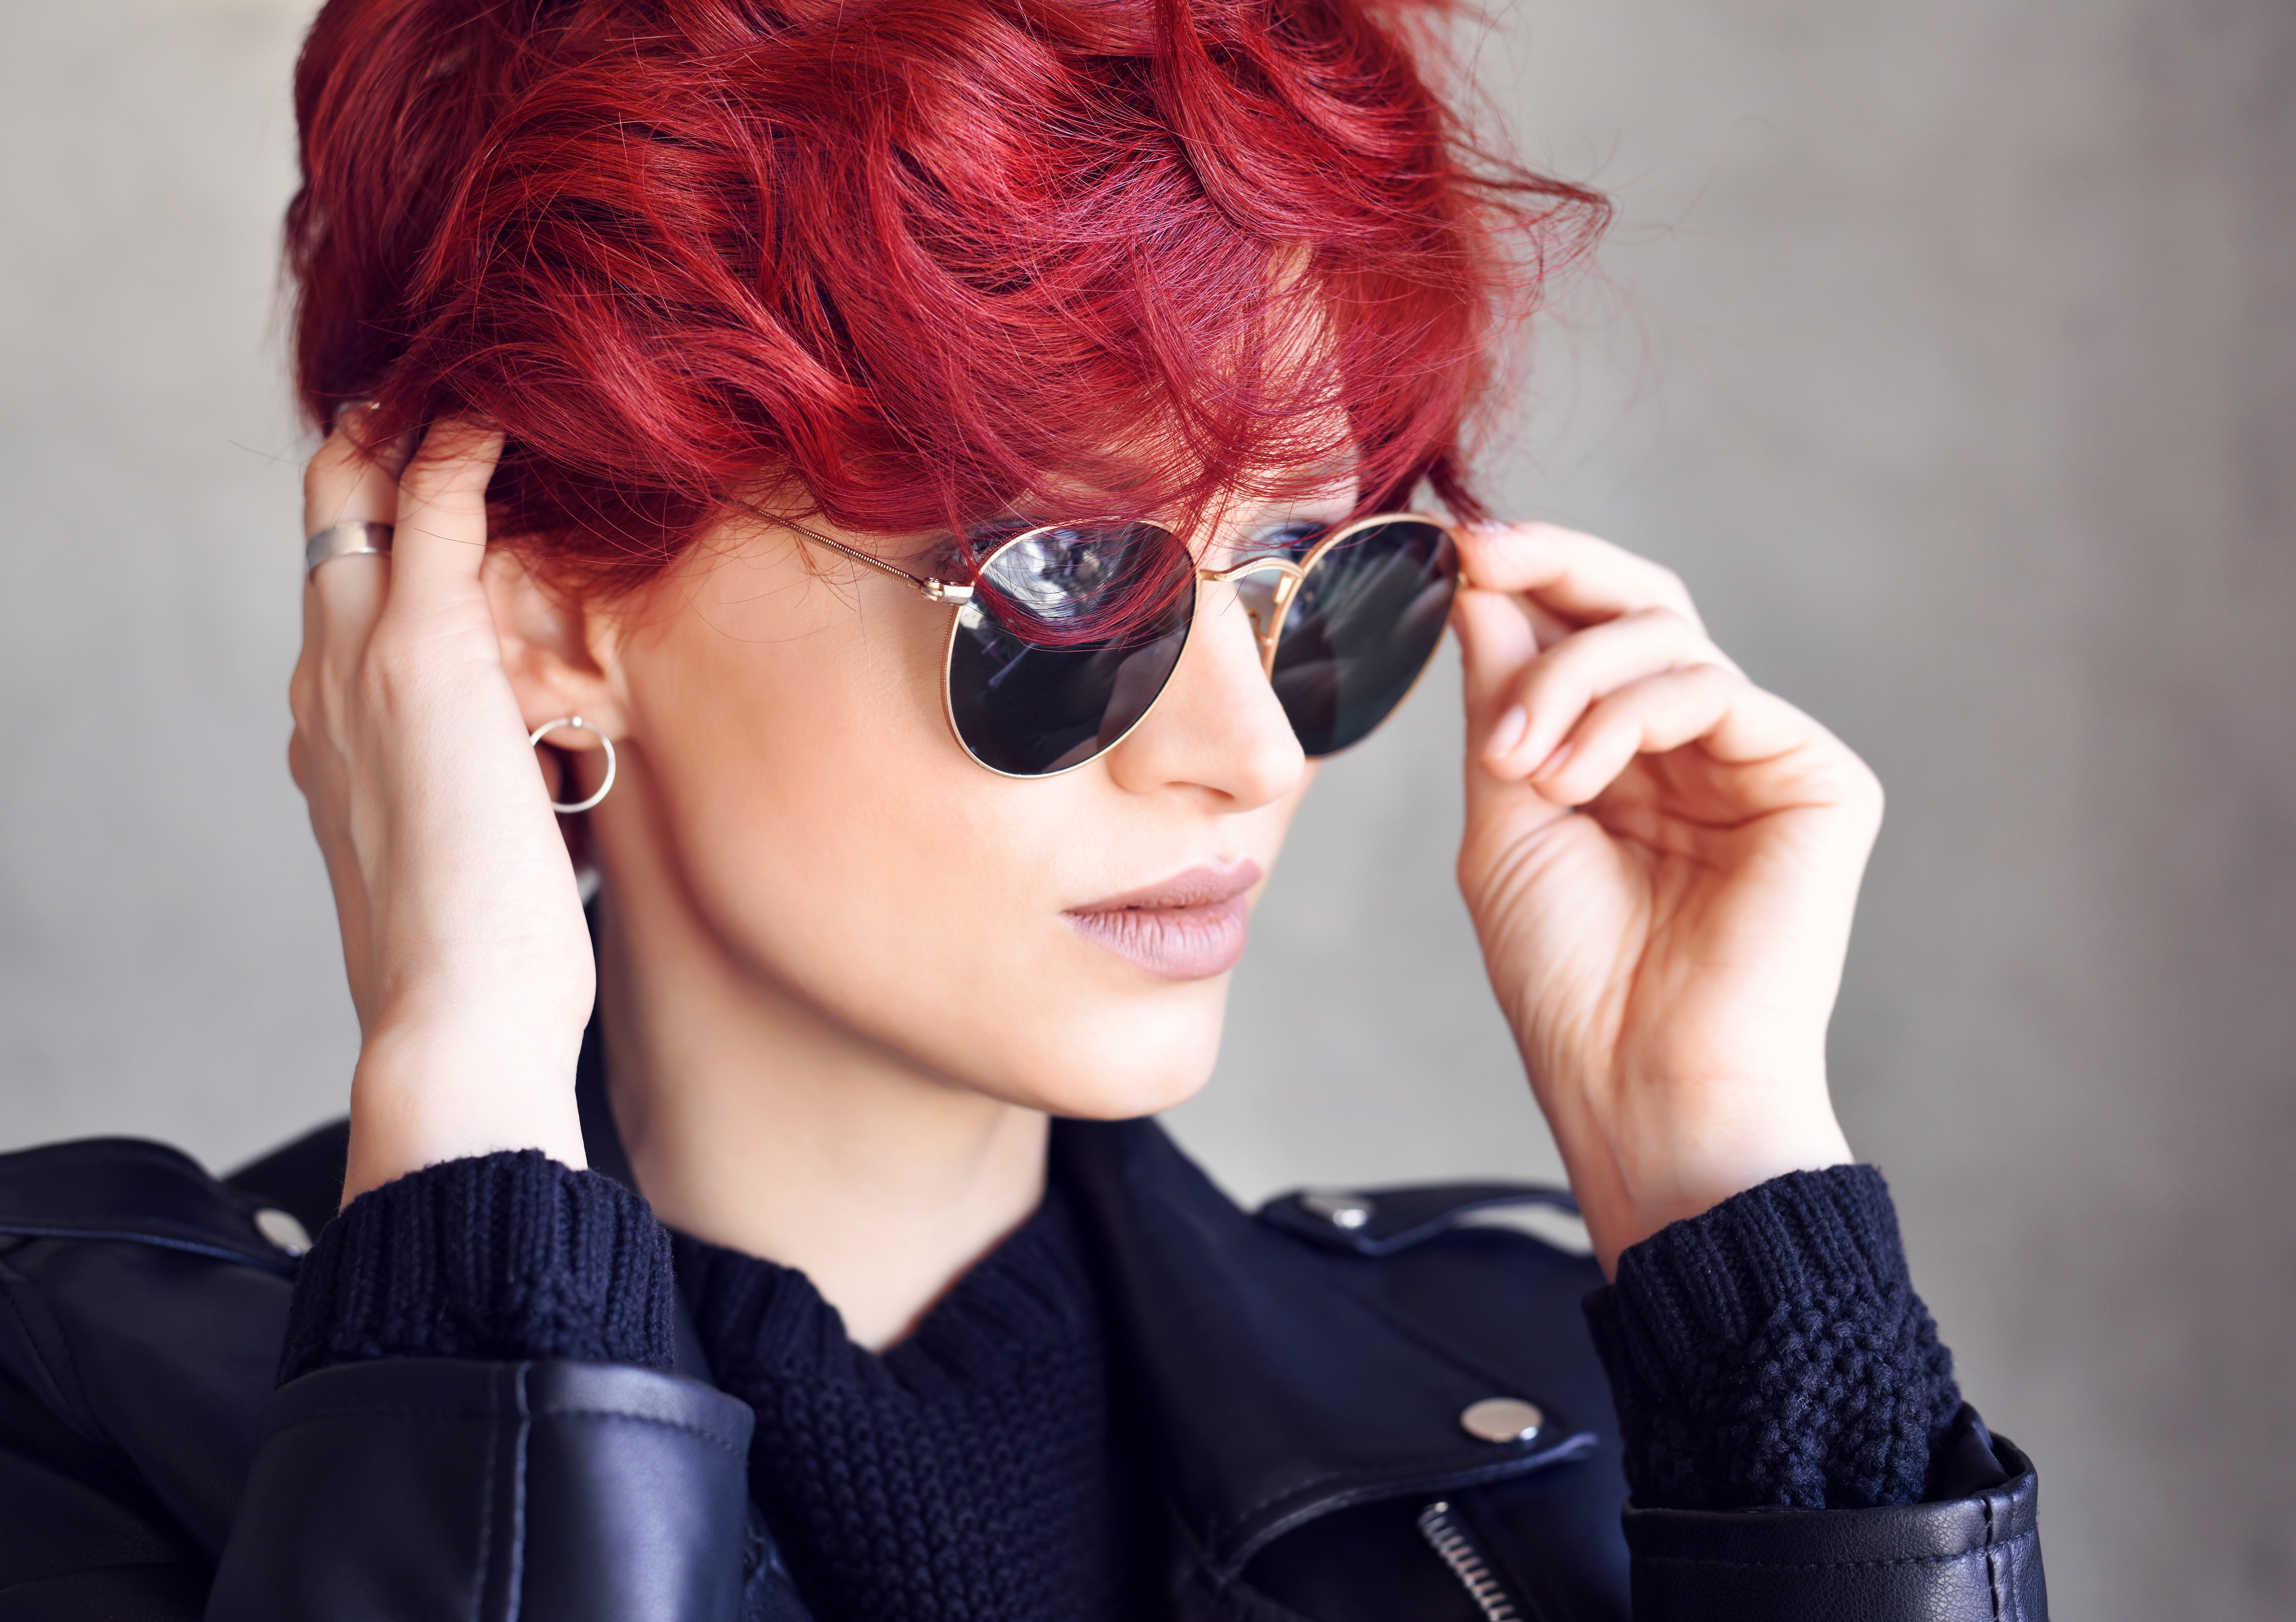 صبغات شعر احمر